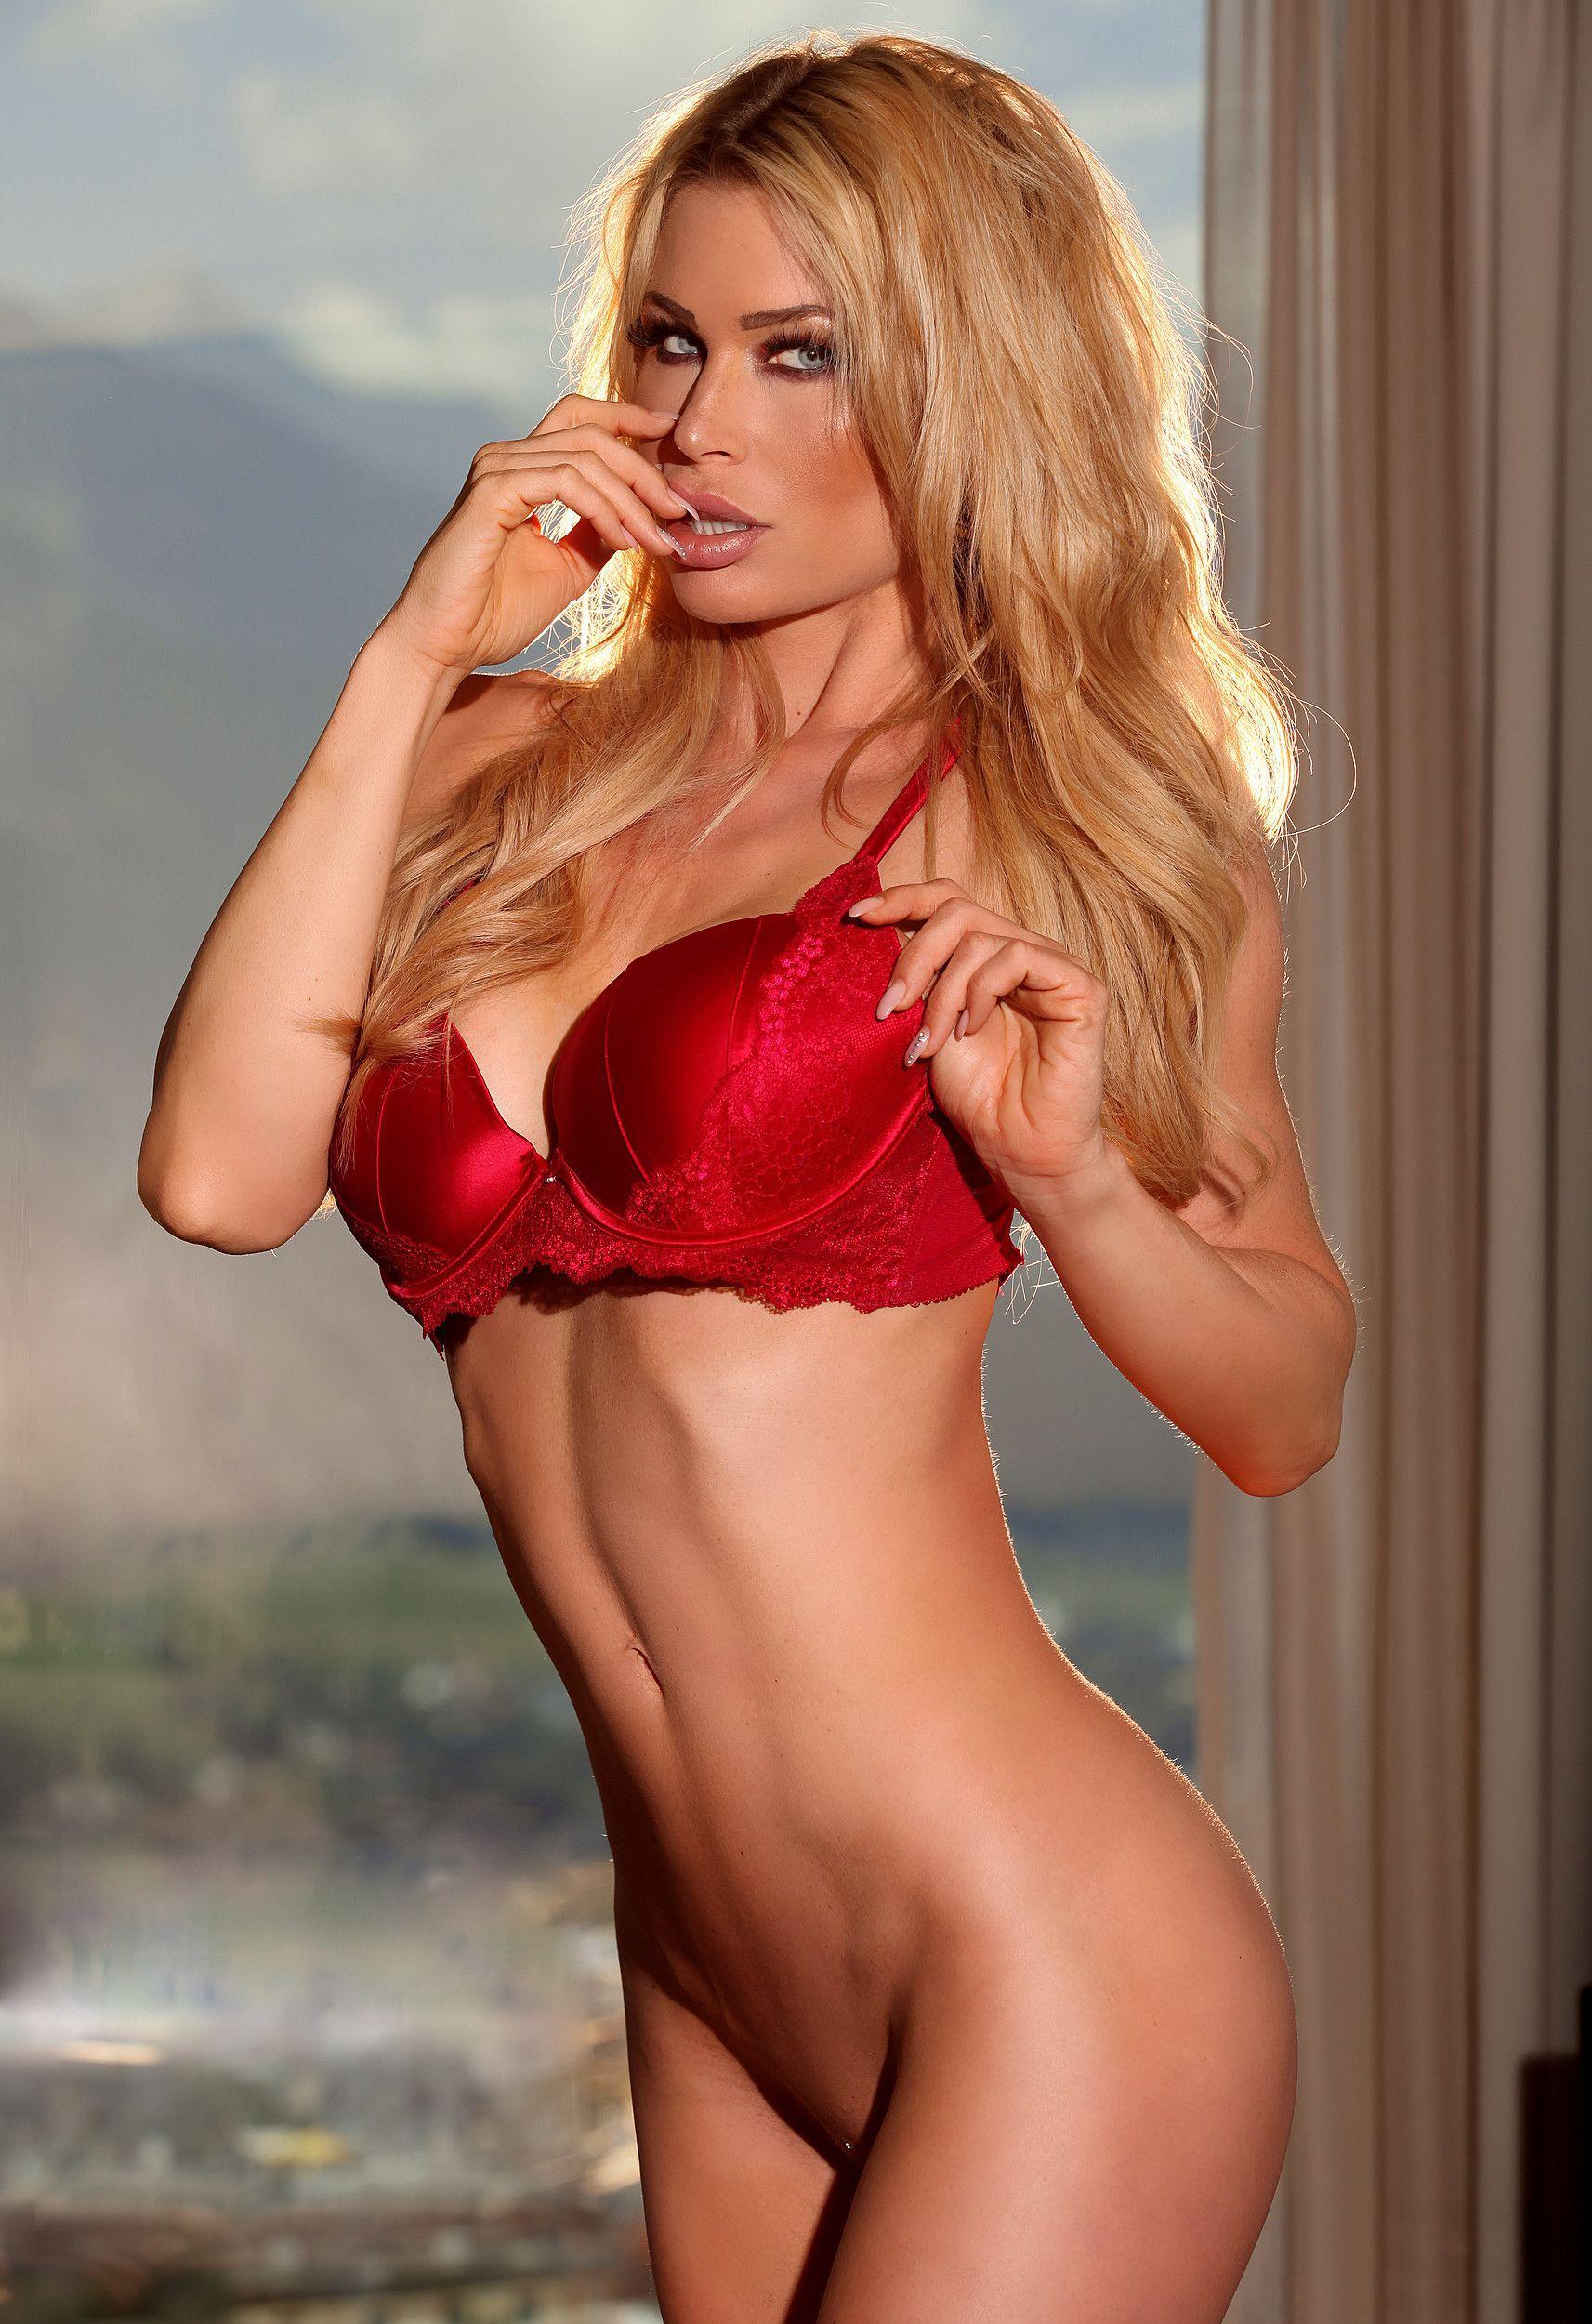 Hot Ramona Bernhard nudes (92 photos), Ass, Hot, Feet, see through 2020